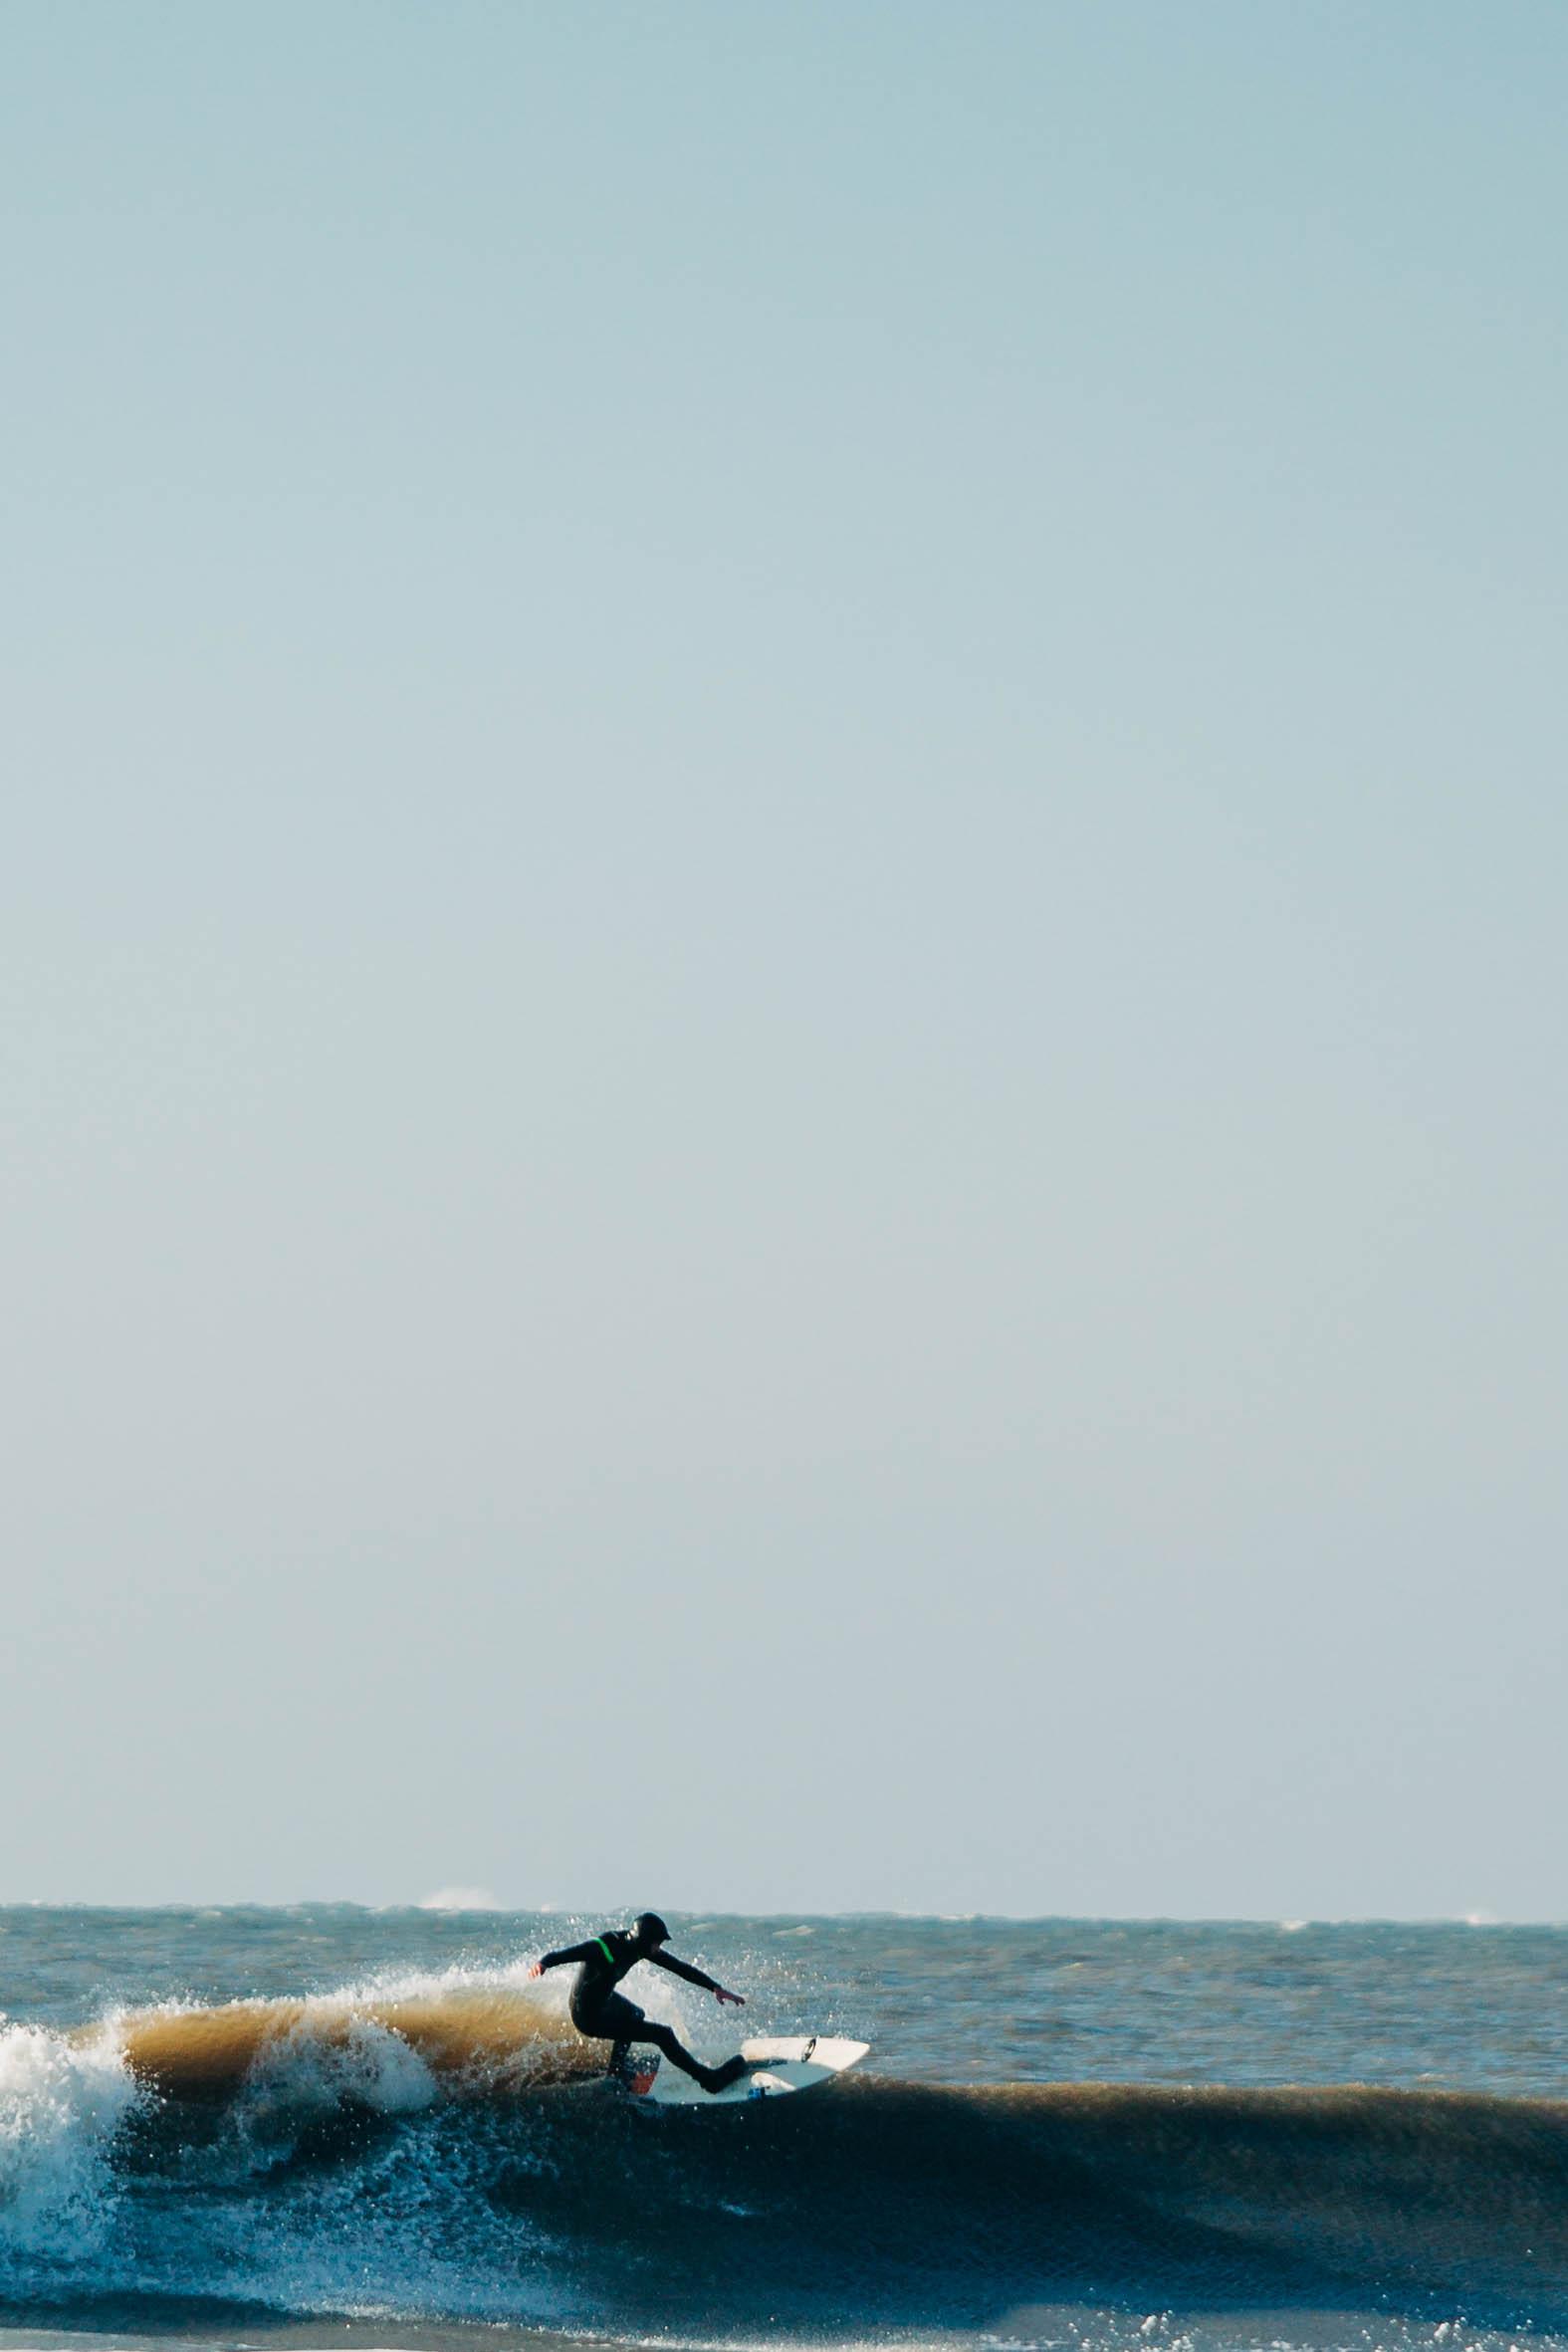 Alex_Sedgmond_Photography-Cardiff-SouthWales-PorthcawlRestbay-Surfing-EzraHames-56.jpg